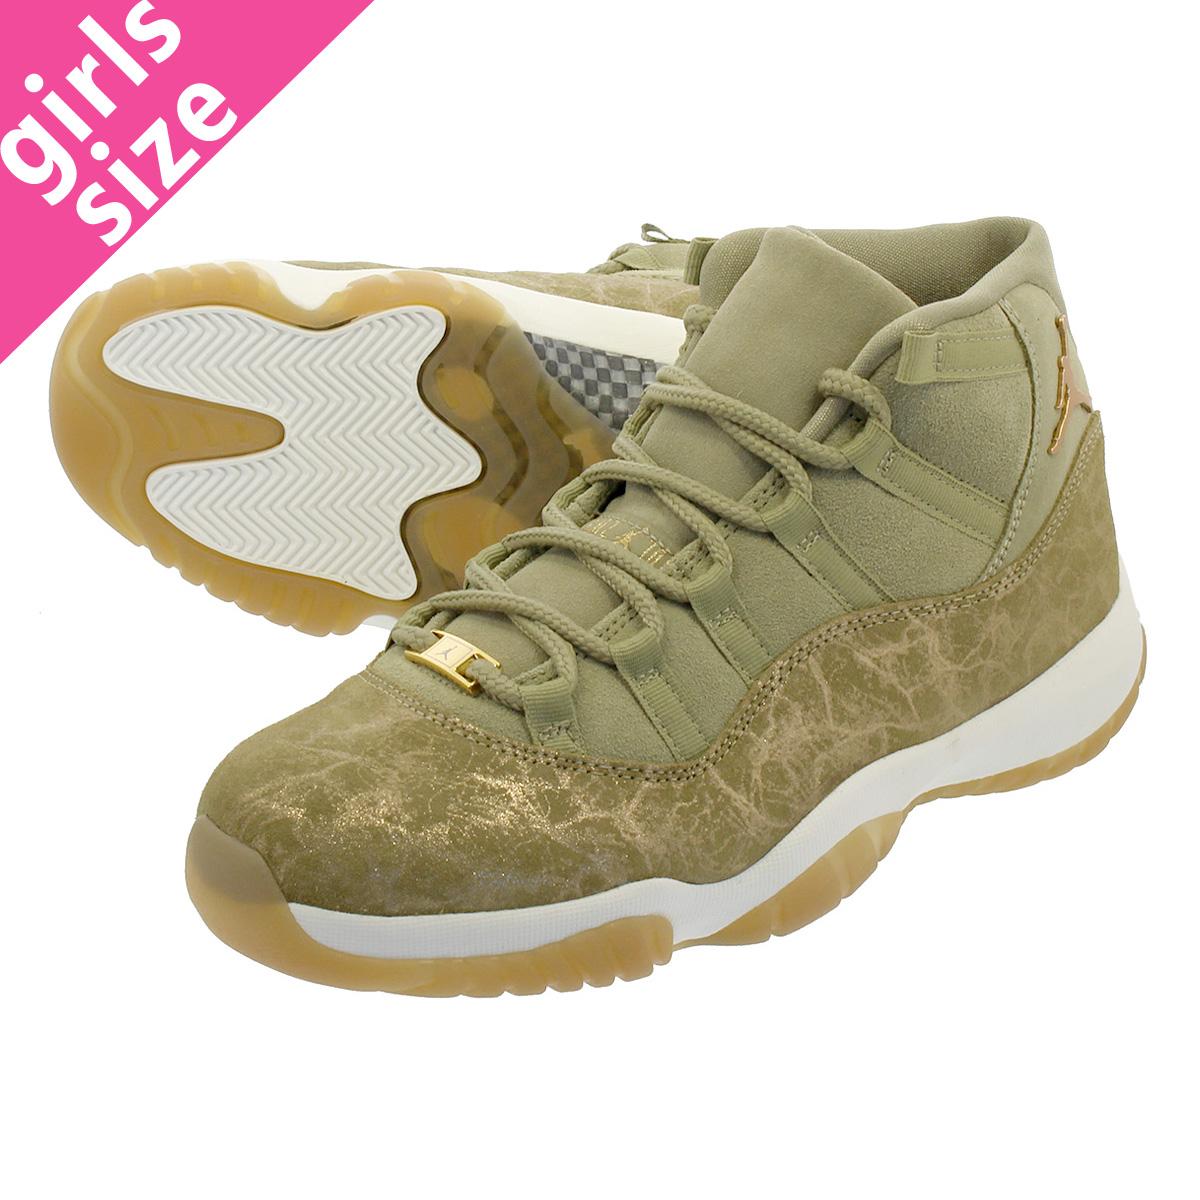 954cdb7a0b892c NIKE WMNS AIR JORDAN 11 RETRO Nike women Air Jordan 11 nostalgic NEUTRAL  OLIVE MTLC STOUT SAIL ar0715-200